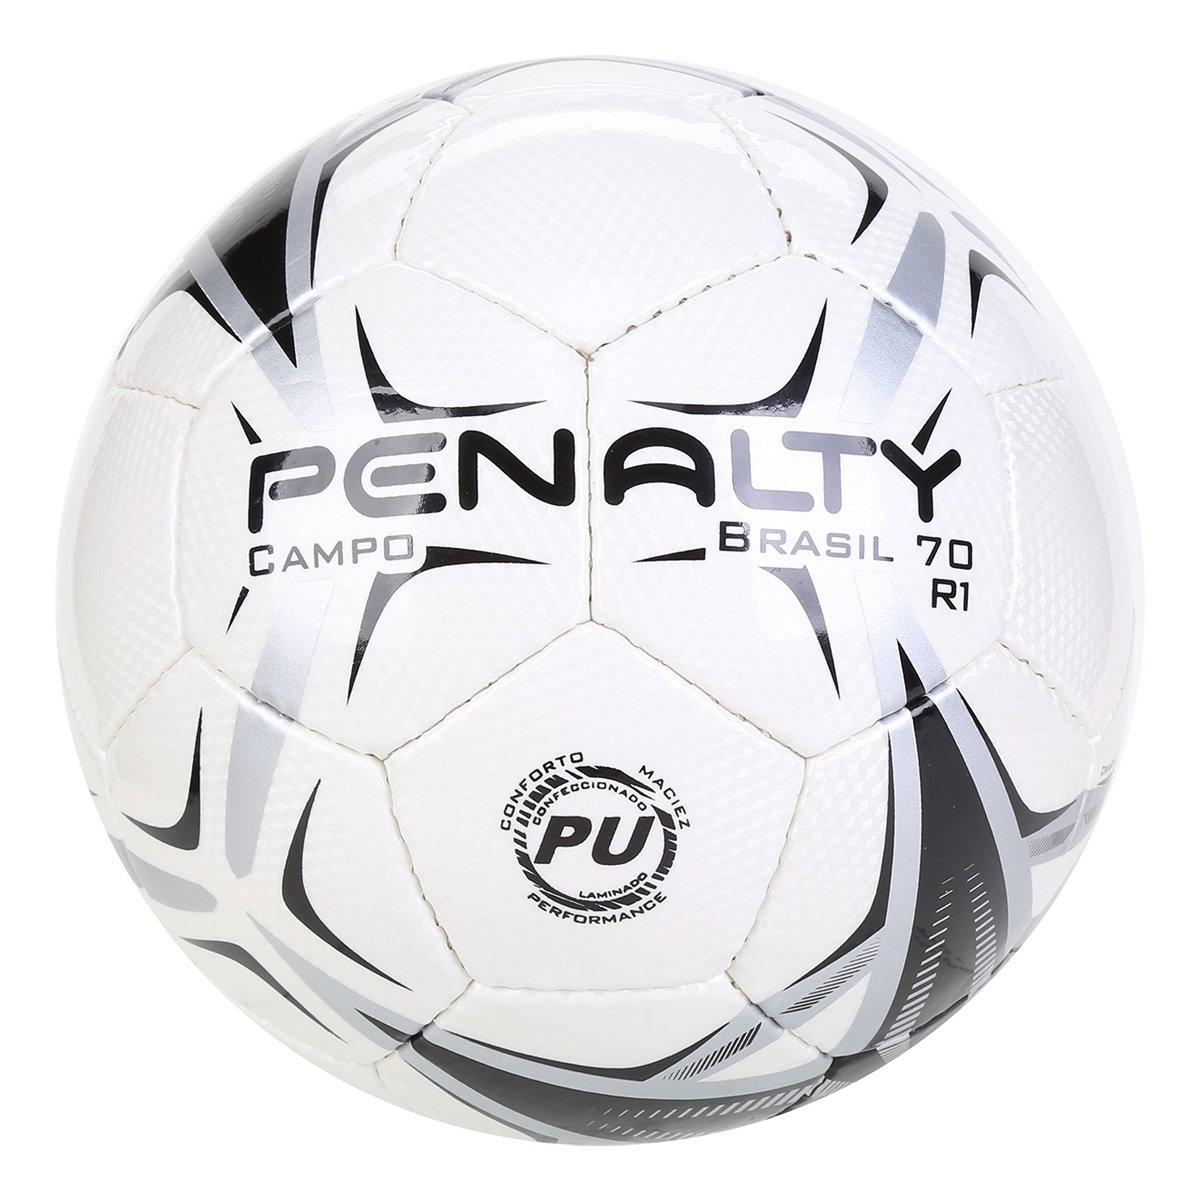 Bola de Futebol Campo Penalty Brasil 70 R1 X